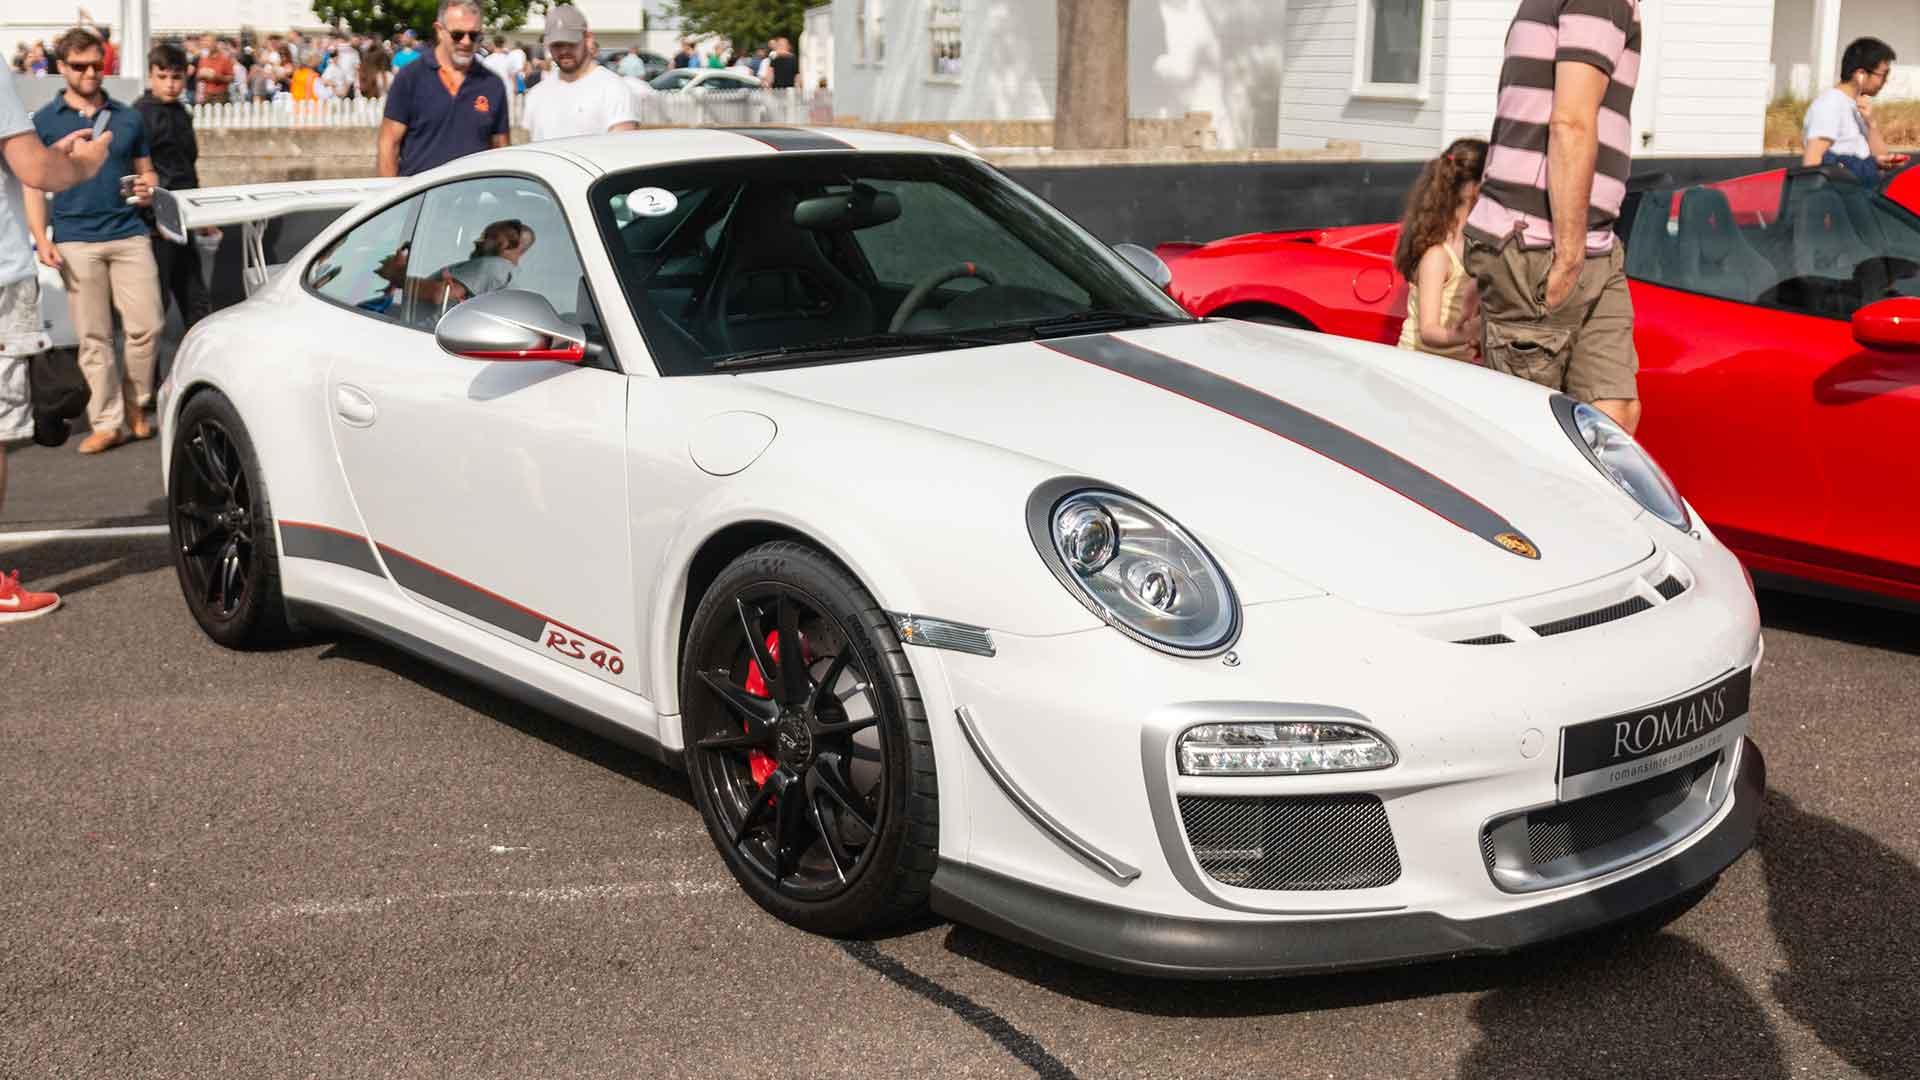 Porsche 911 GT3 RS 4.0 at Goodwood Supercar Sunday